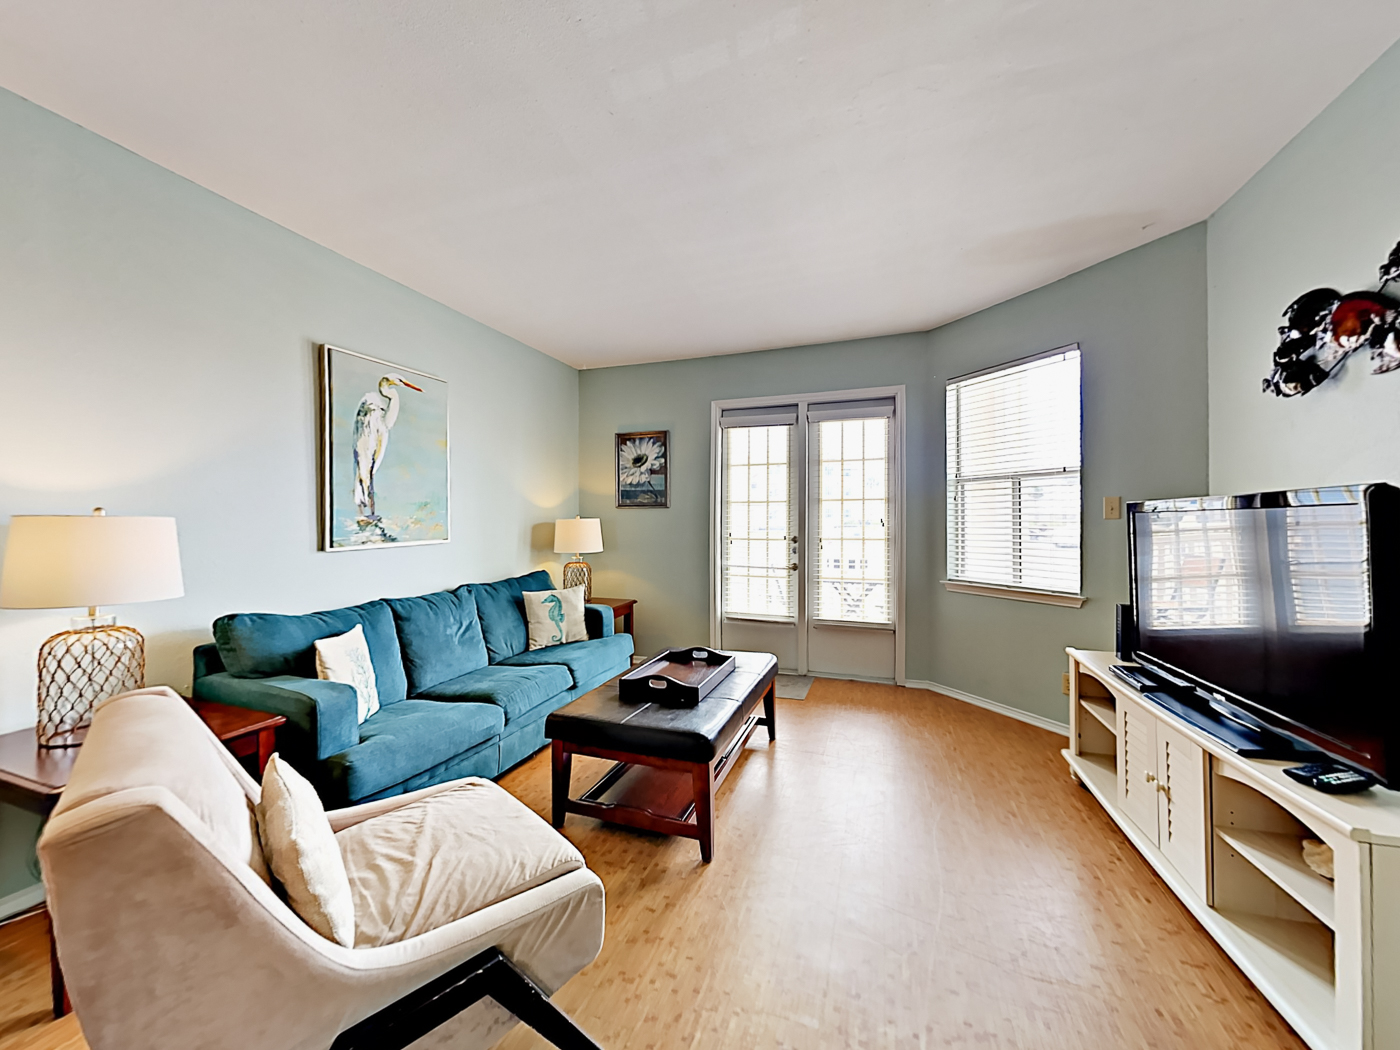 Corpus Christi TX Vacation Rental An open-concept floor